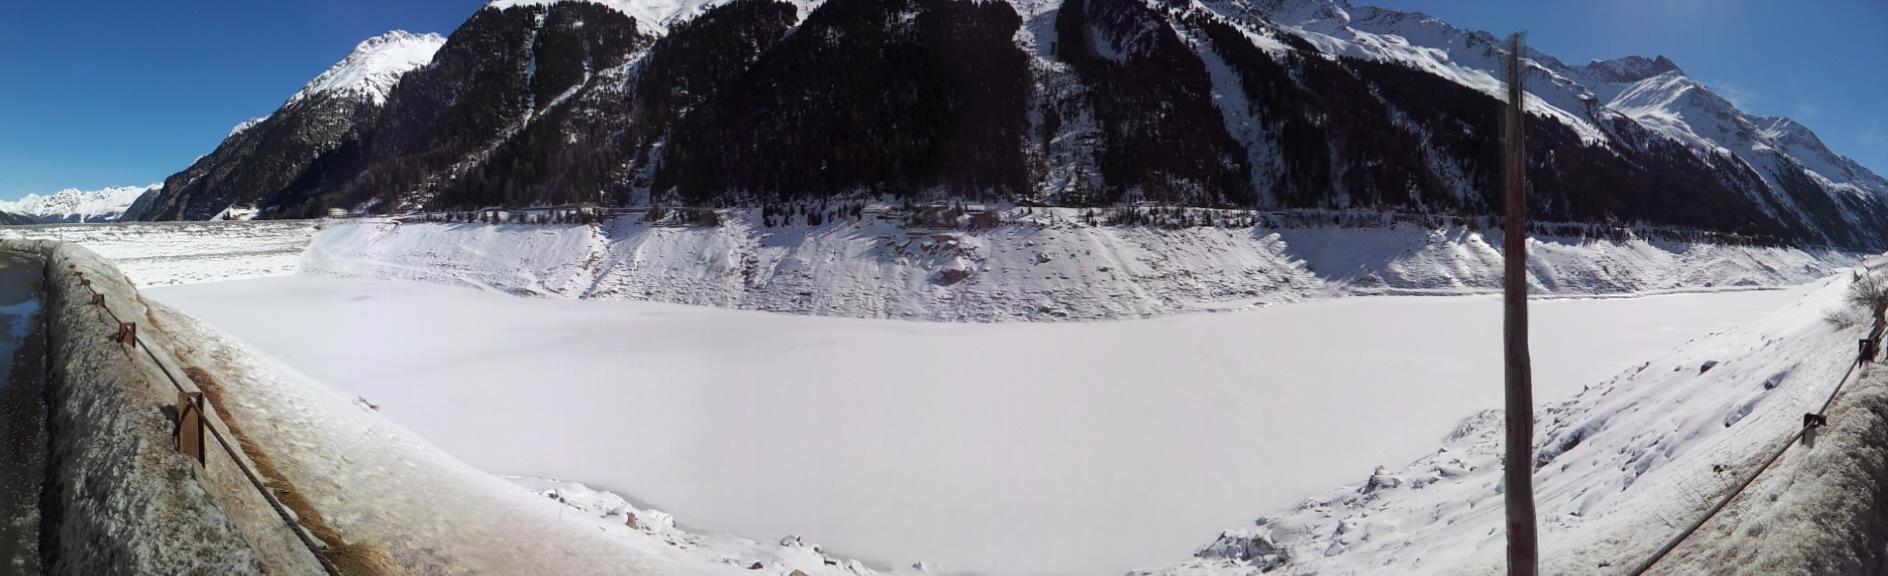 Gepatsch Reservoir Austria in Winter